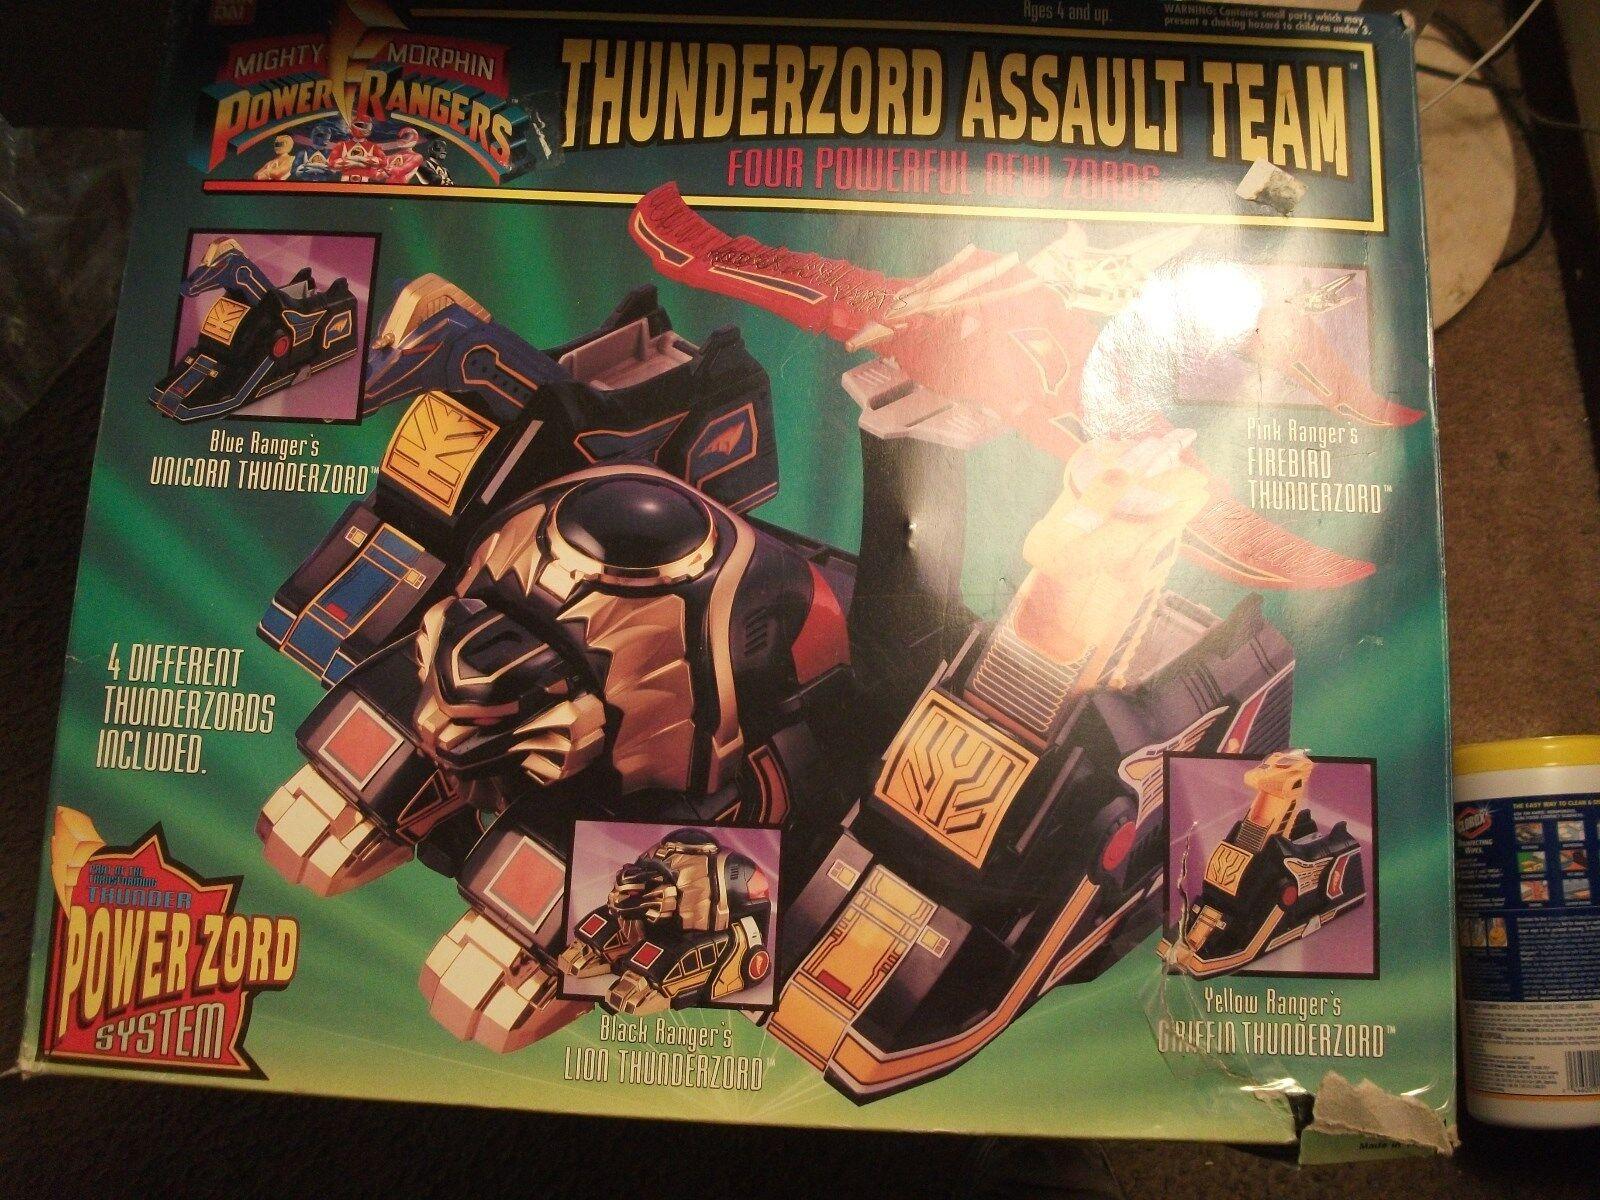 Vintage Thunderzord Assault Team Bandai Power Rangers Zords w/ Box 1994